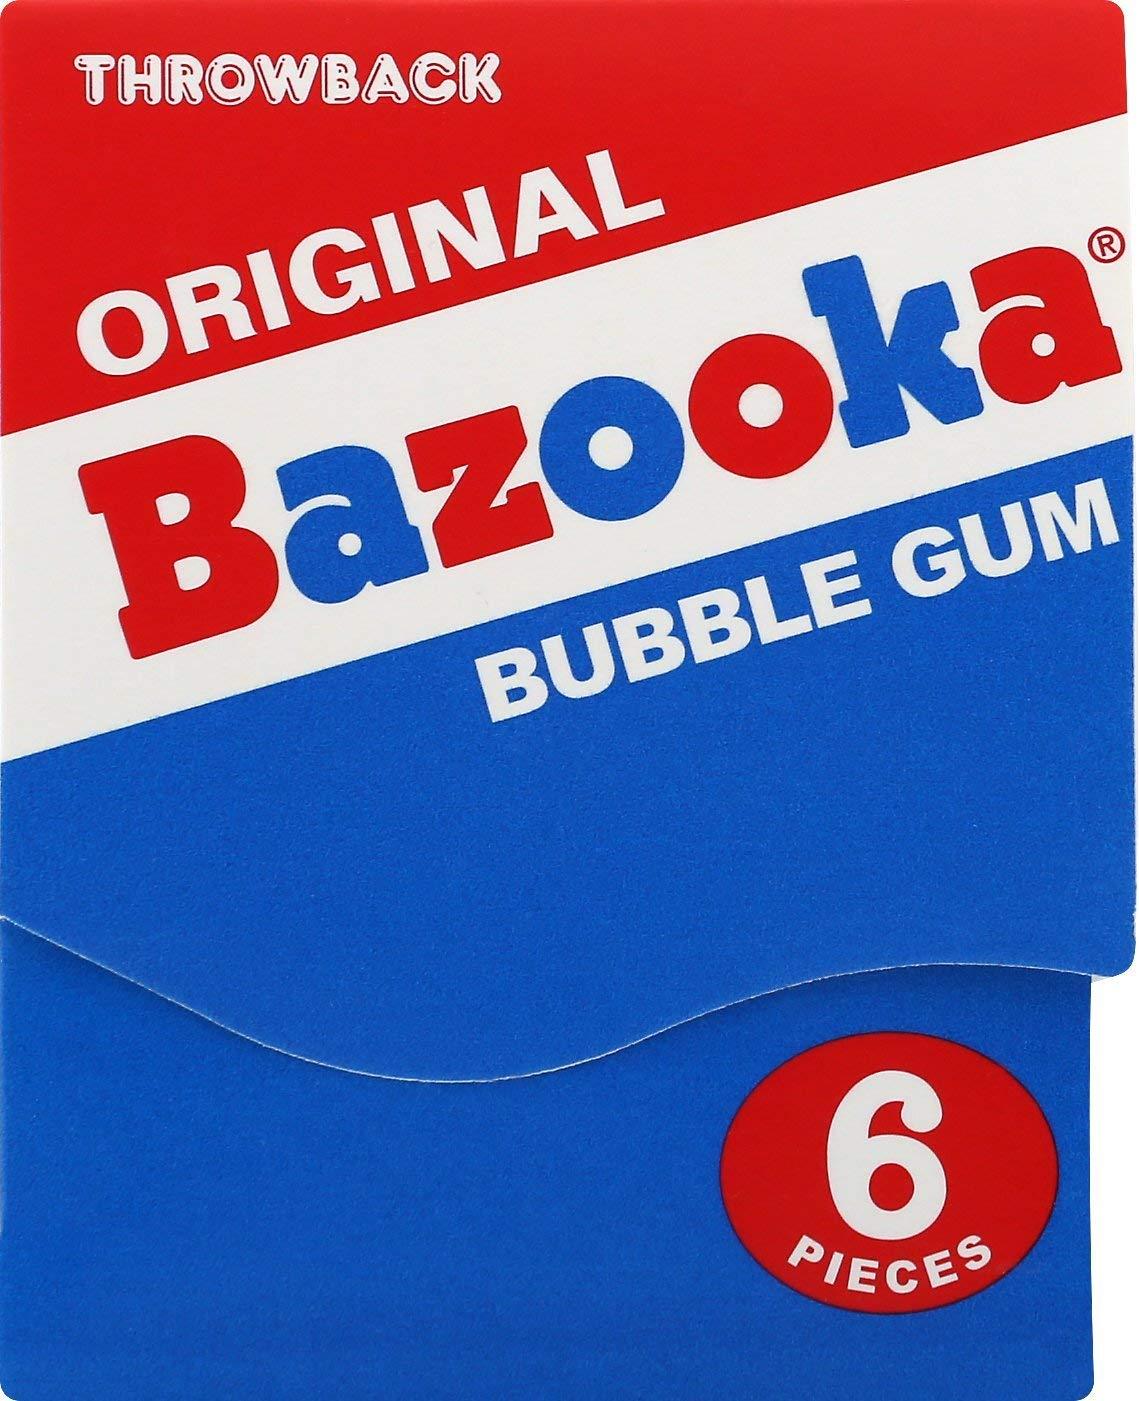 Bazooka Bubble Gum Original Nostalgia Mini-Wallet Pack - 6Count (Pack Of 12) by Bazooka